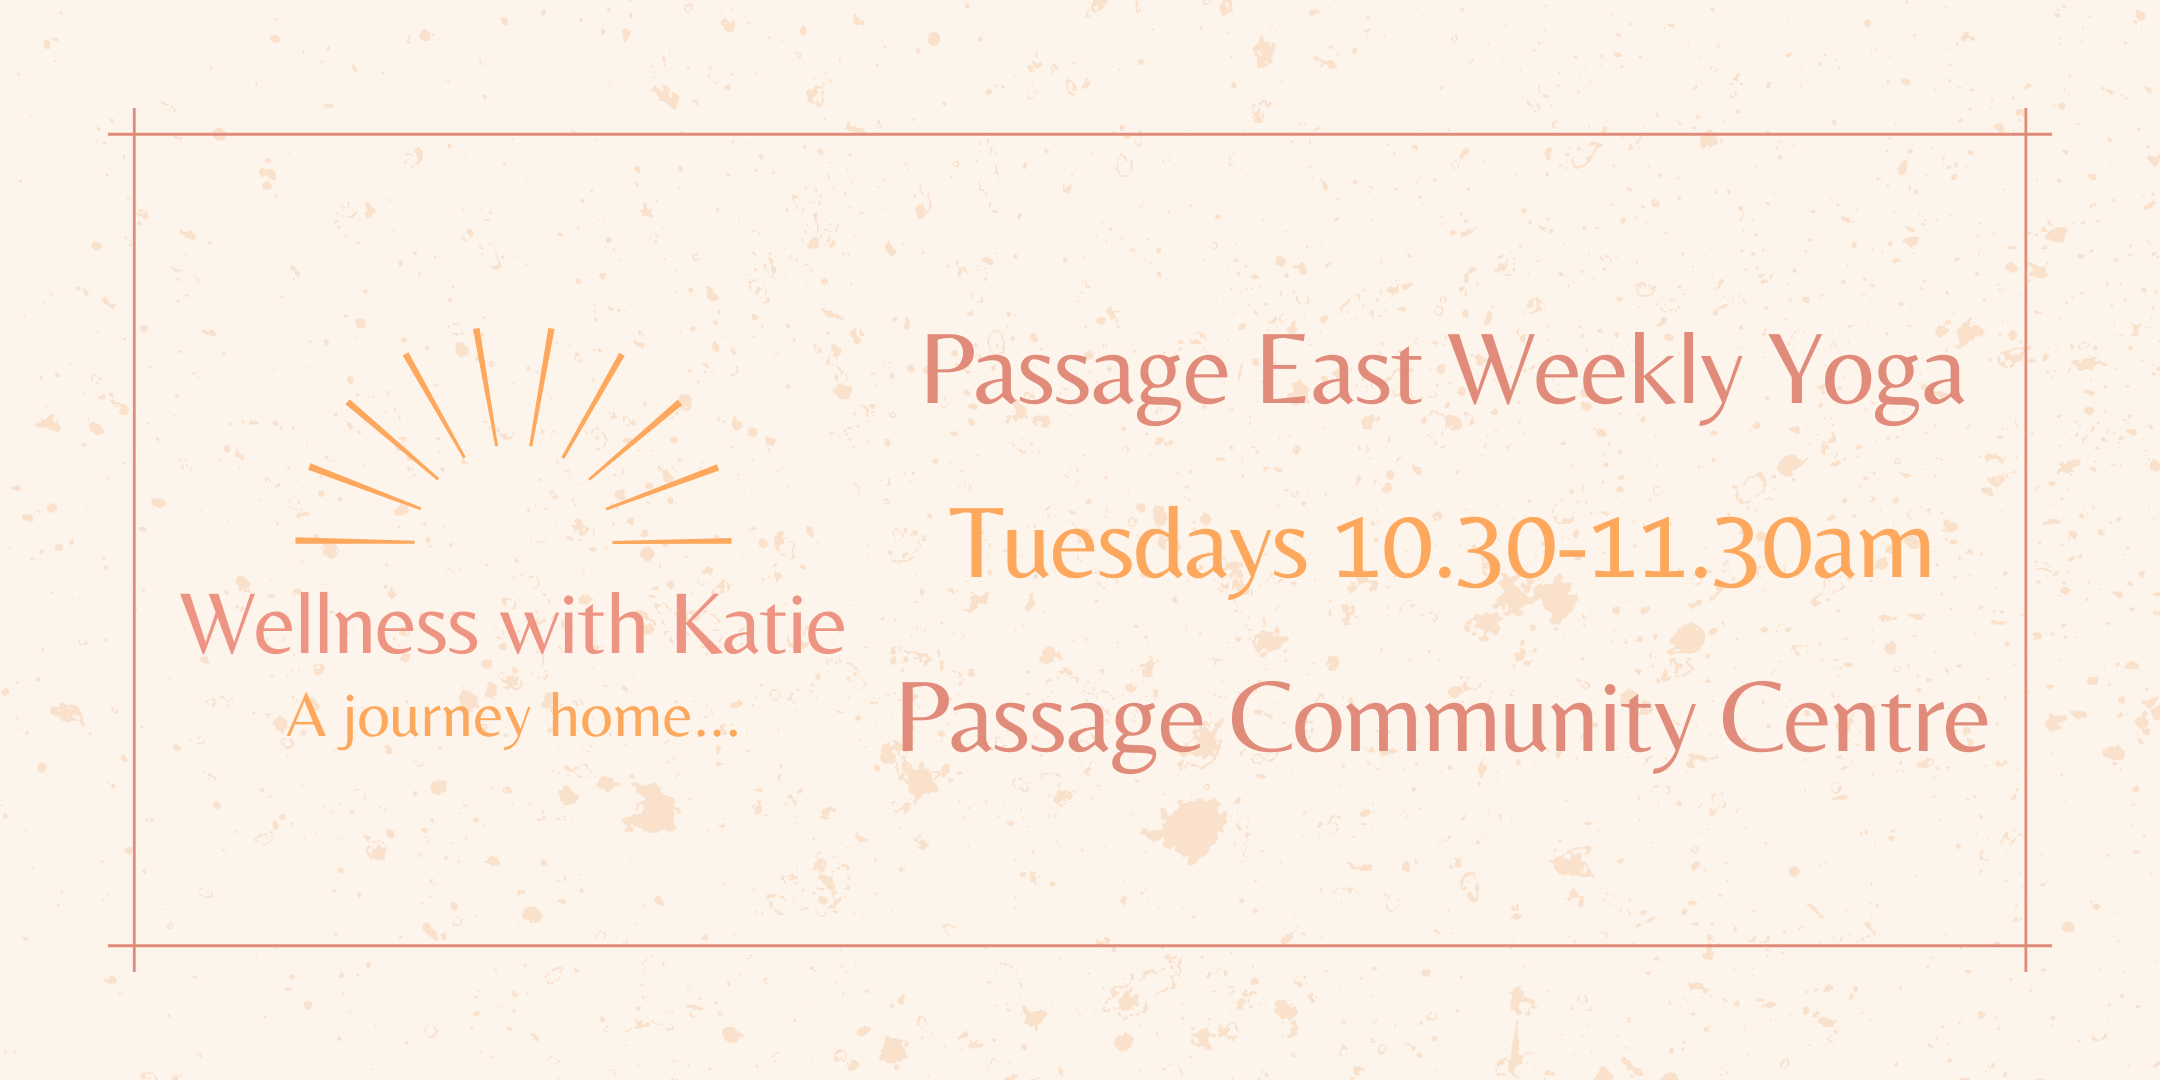 Weekly Yoga Passage East with Katie Duggan